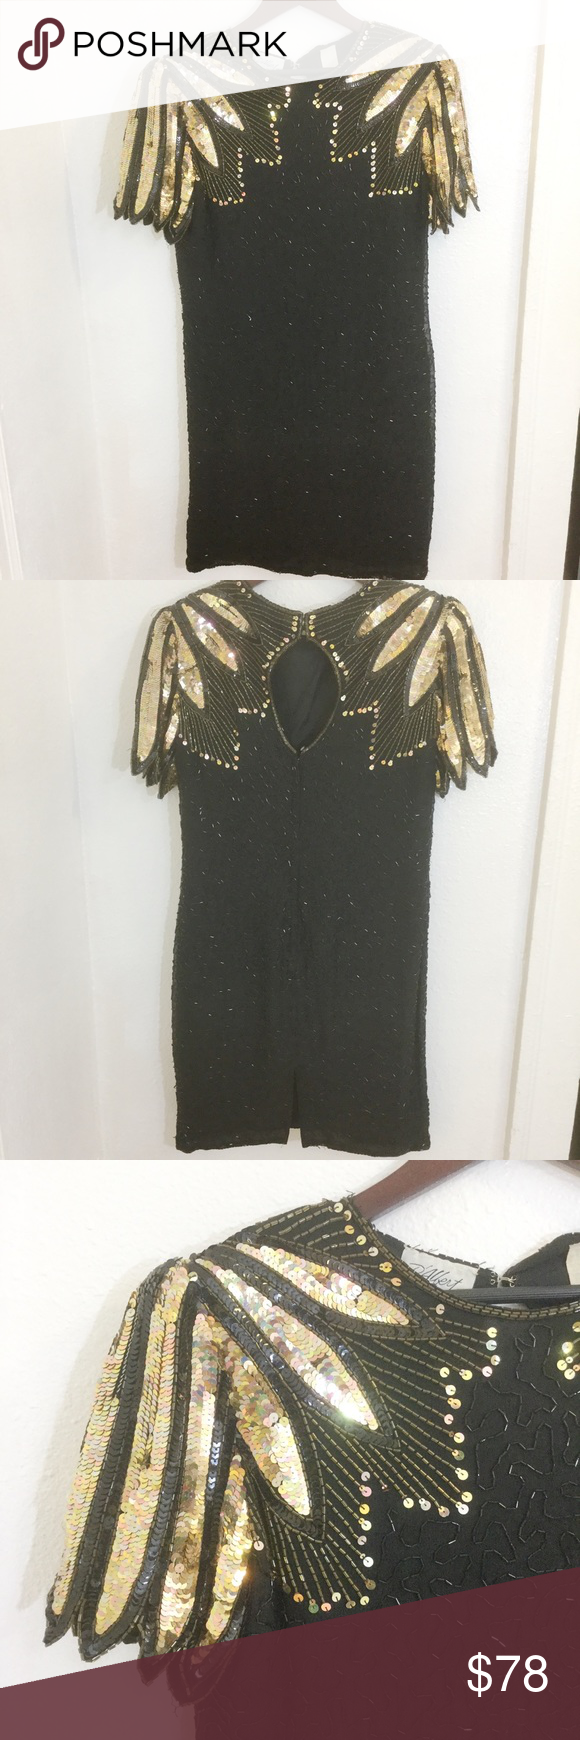 Vintage Black And Gold Beaded Cocktail Dress Beaded Cocktail Dress Prom Dresses Vintage Vintage Dresses [ 1740 x 580 Pixel ]